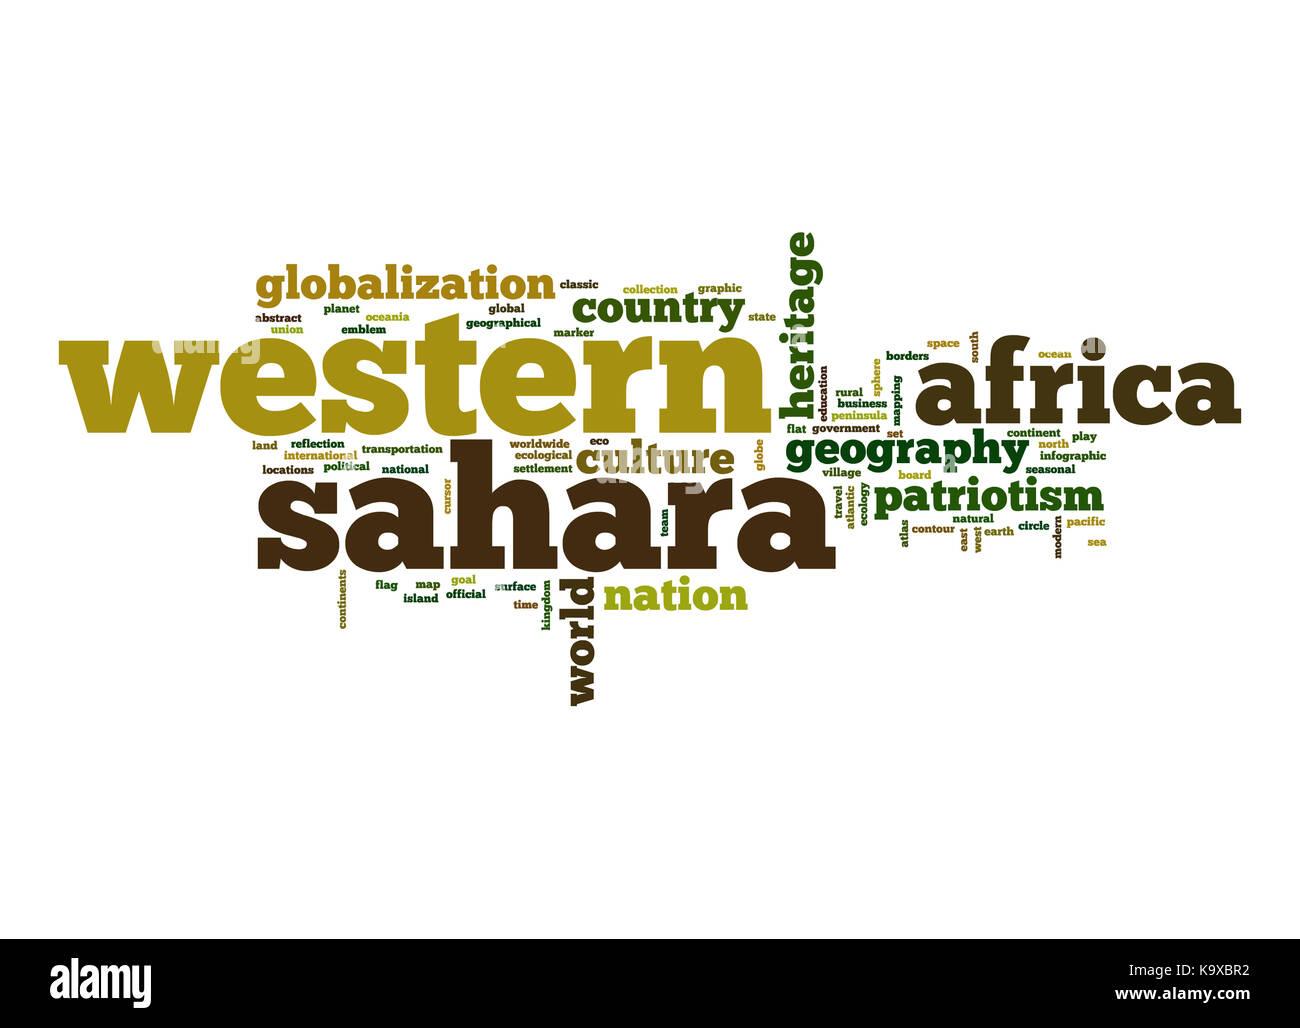 Western Sahara word cloud - Stock Image